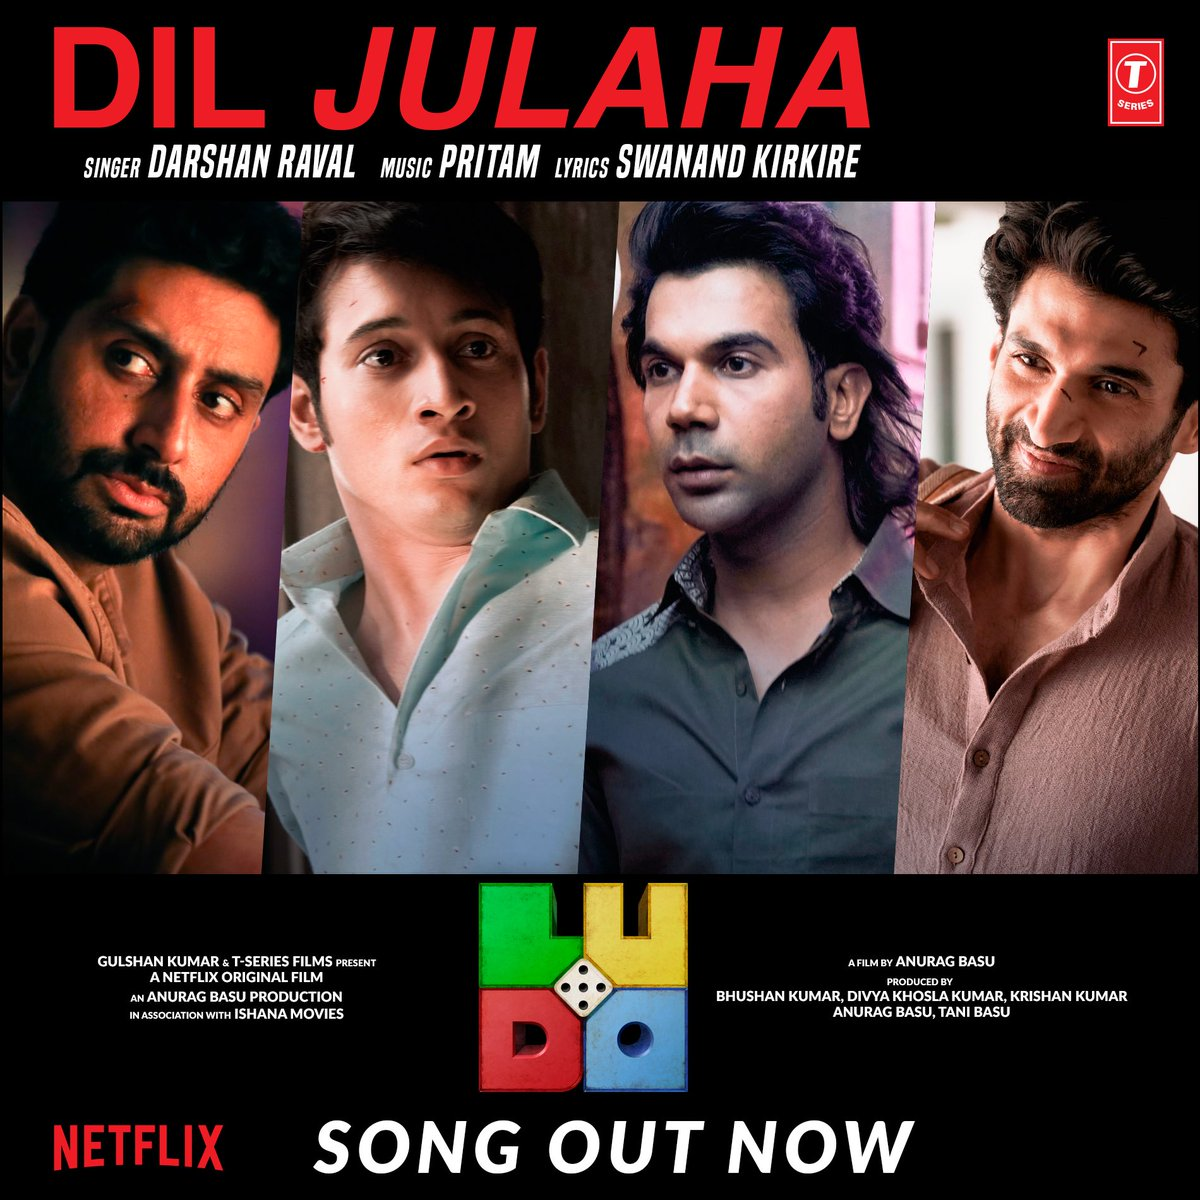 Super excited to announce tht #DilJulaha from my film #Ludo is out! Streaming now  @juniorbachchan #AdityaRoyKapur @TripathiiPankaj @sanyamalhotra07 @fattysanashaikh @Pearle_Maaney #RohitSaraf #InayatVerma @AshaNegi7 @shalinivatsa1 @basuanurag #BhushanKumar